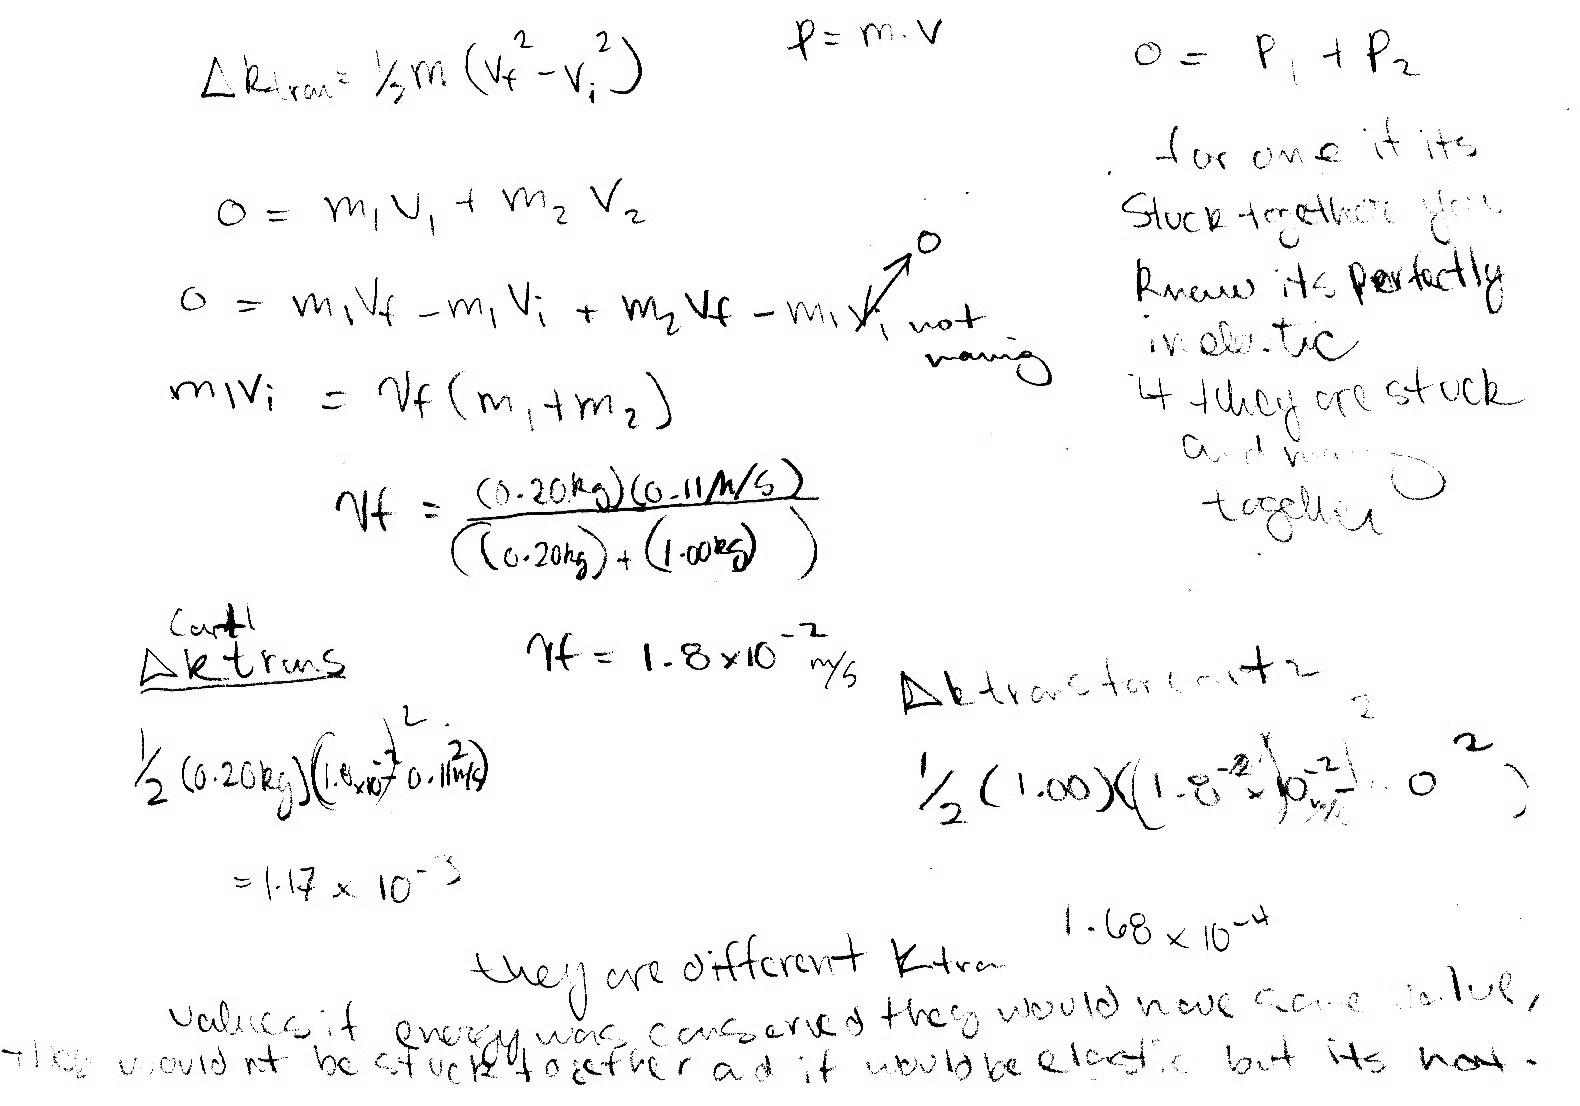 dog's blog: boring but important: Physics final exam problem ...